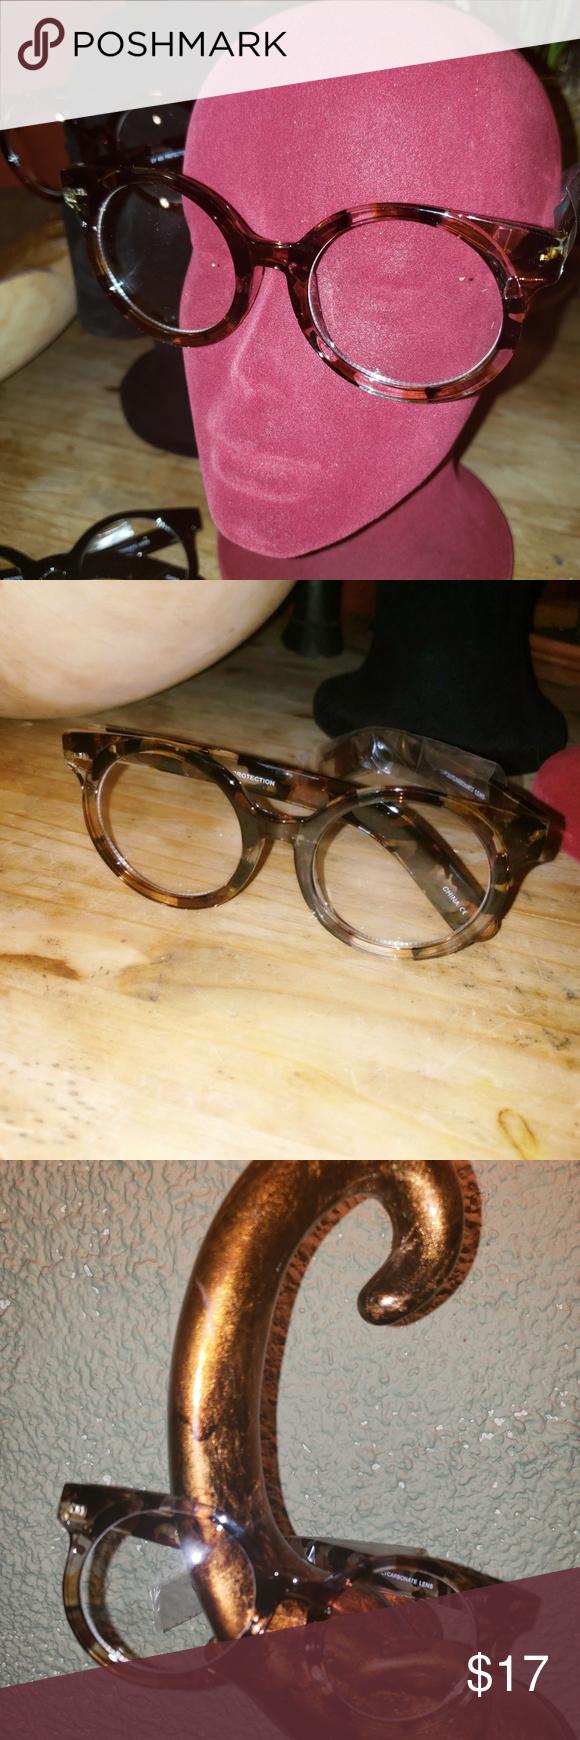 47ab8bb5b421 Retro Round Clear Lens Glasses Animal Print Round Oversized Retro Style  Clear Lens Fashion Eyewear Accessories